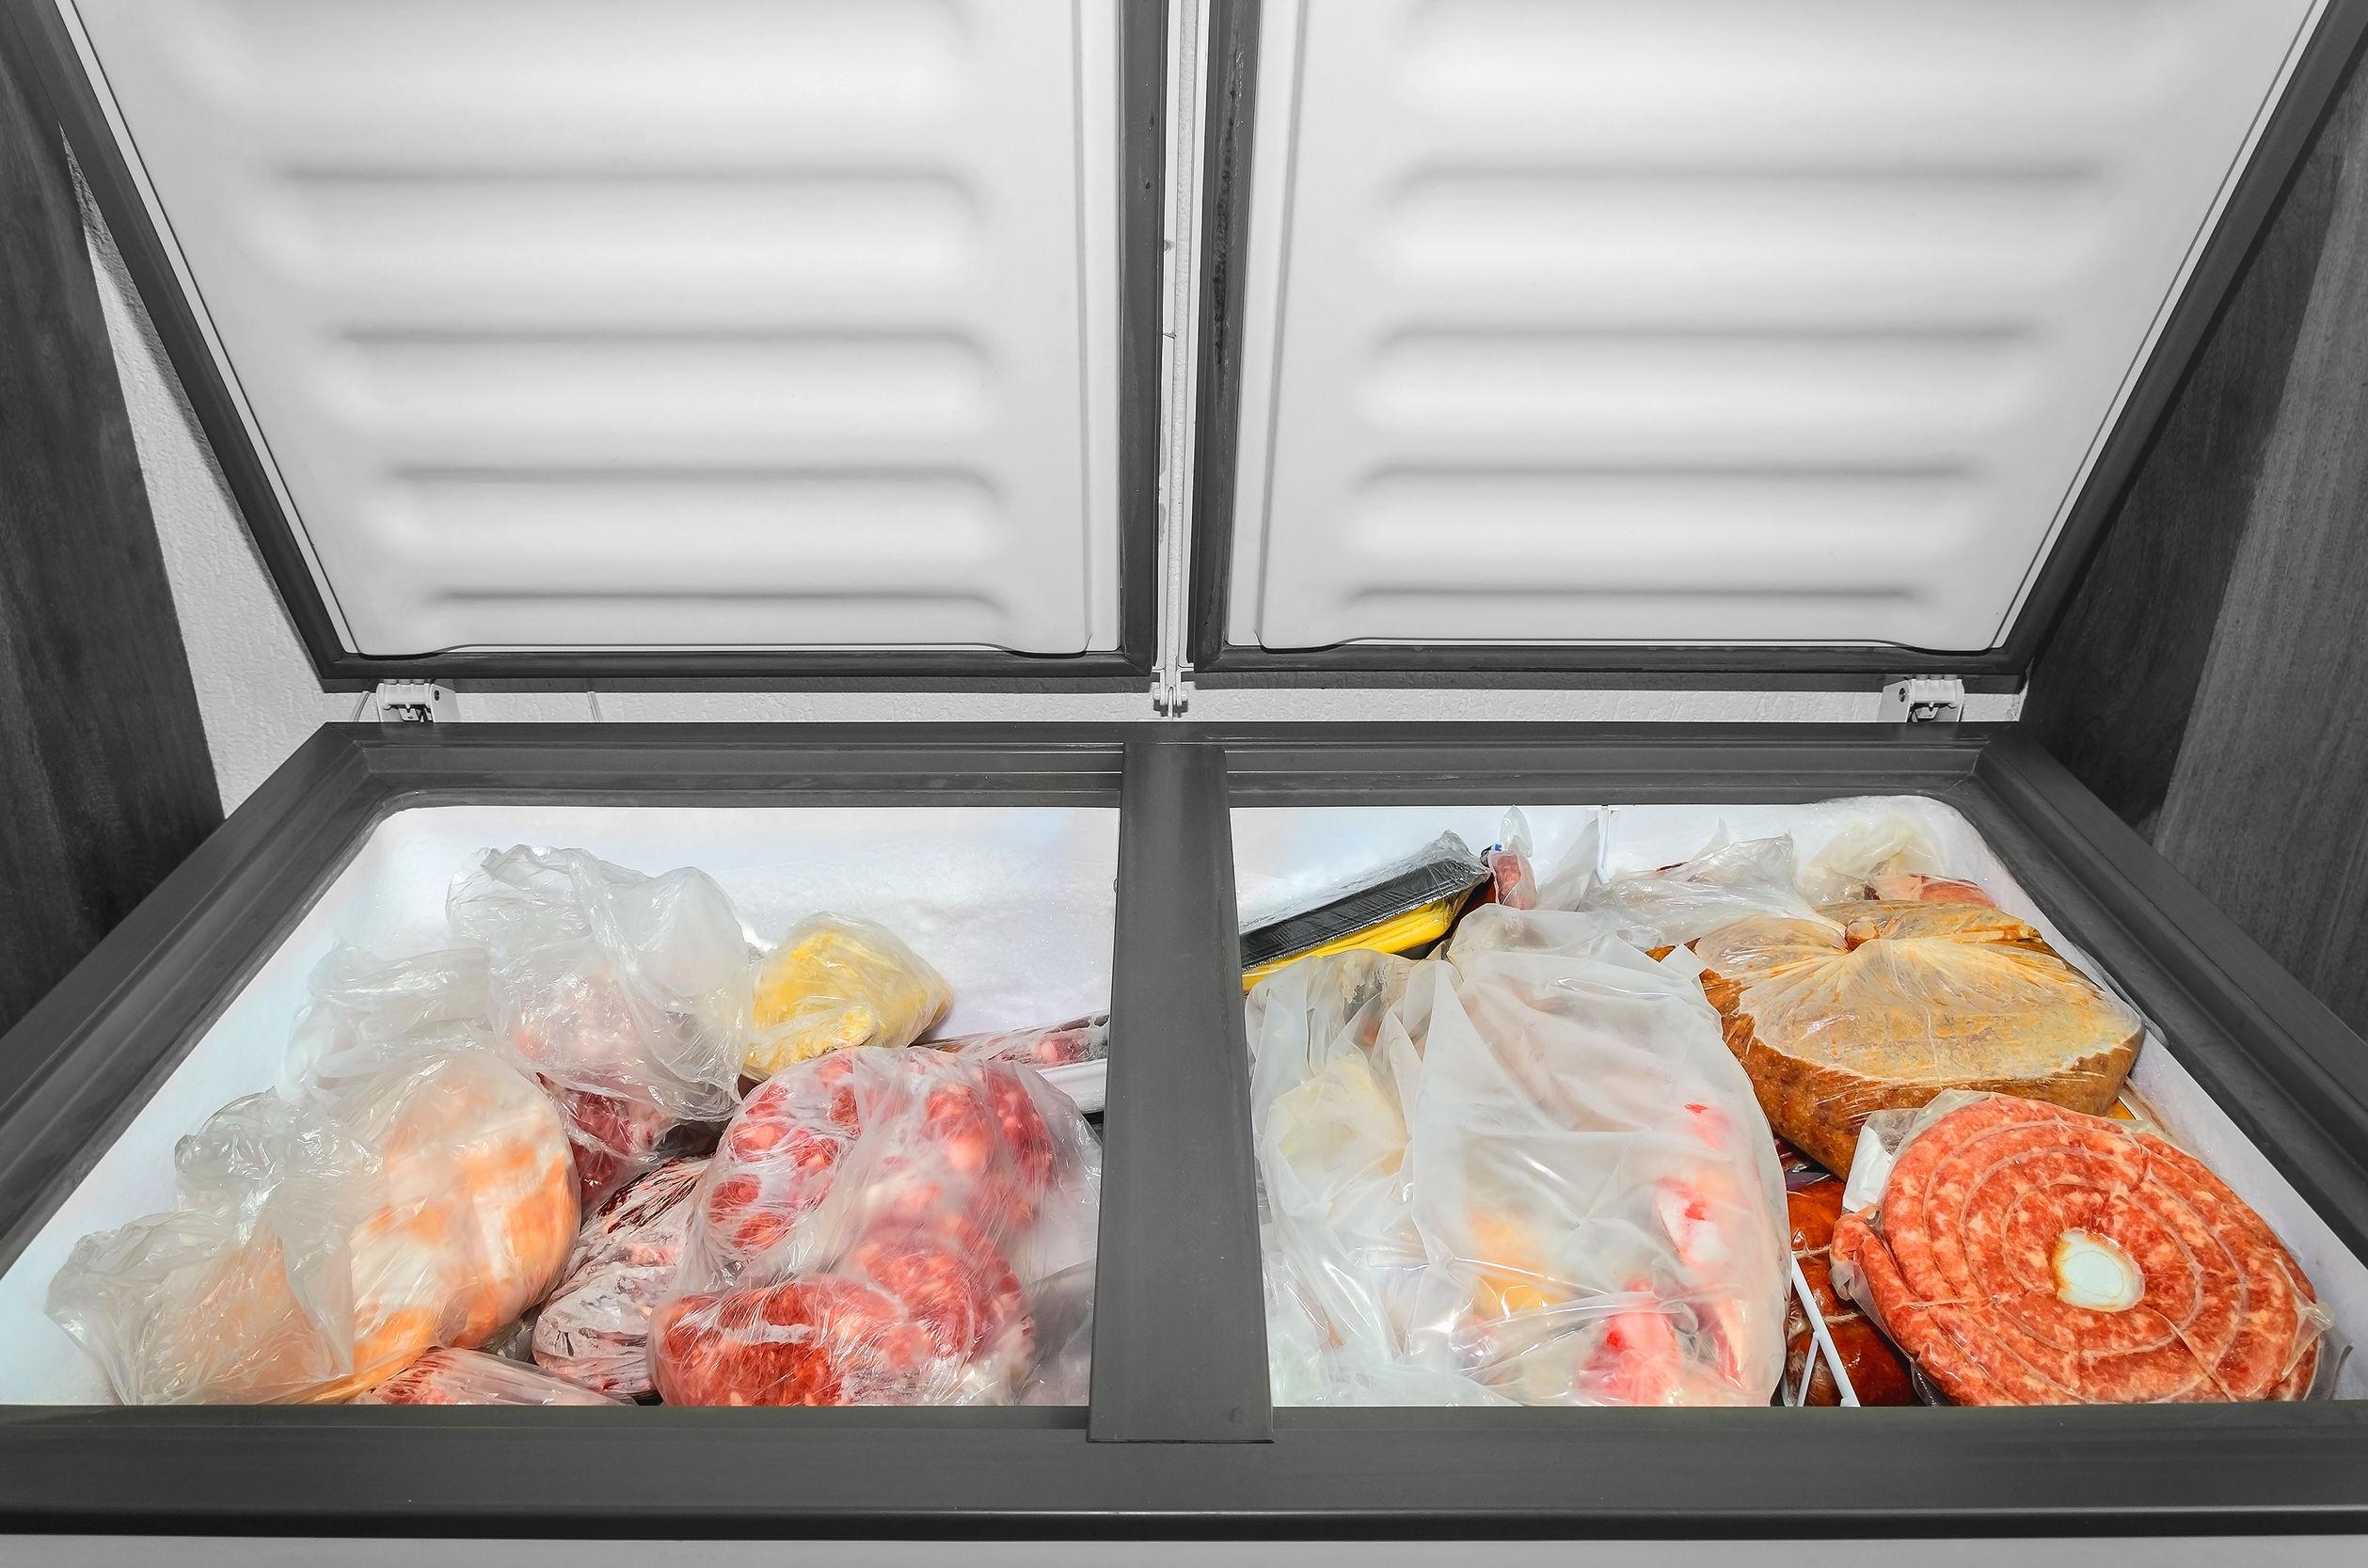 Congelador horizontal: ¿Cuál es el mejor del 2020?